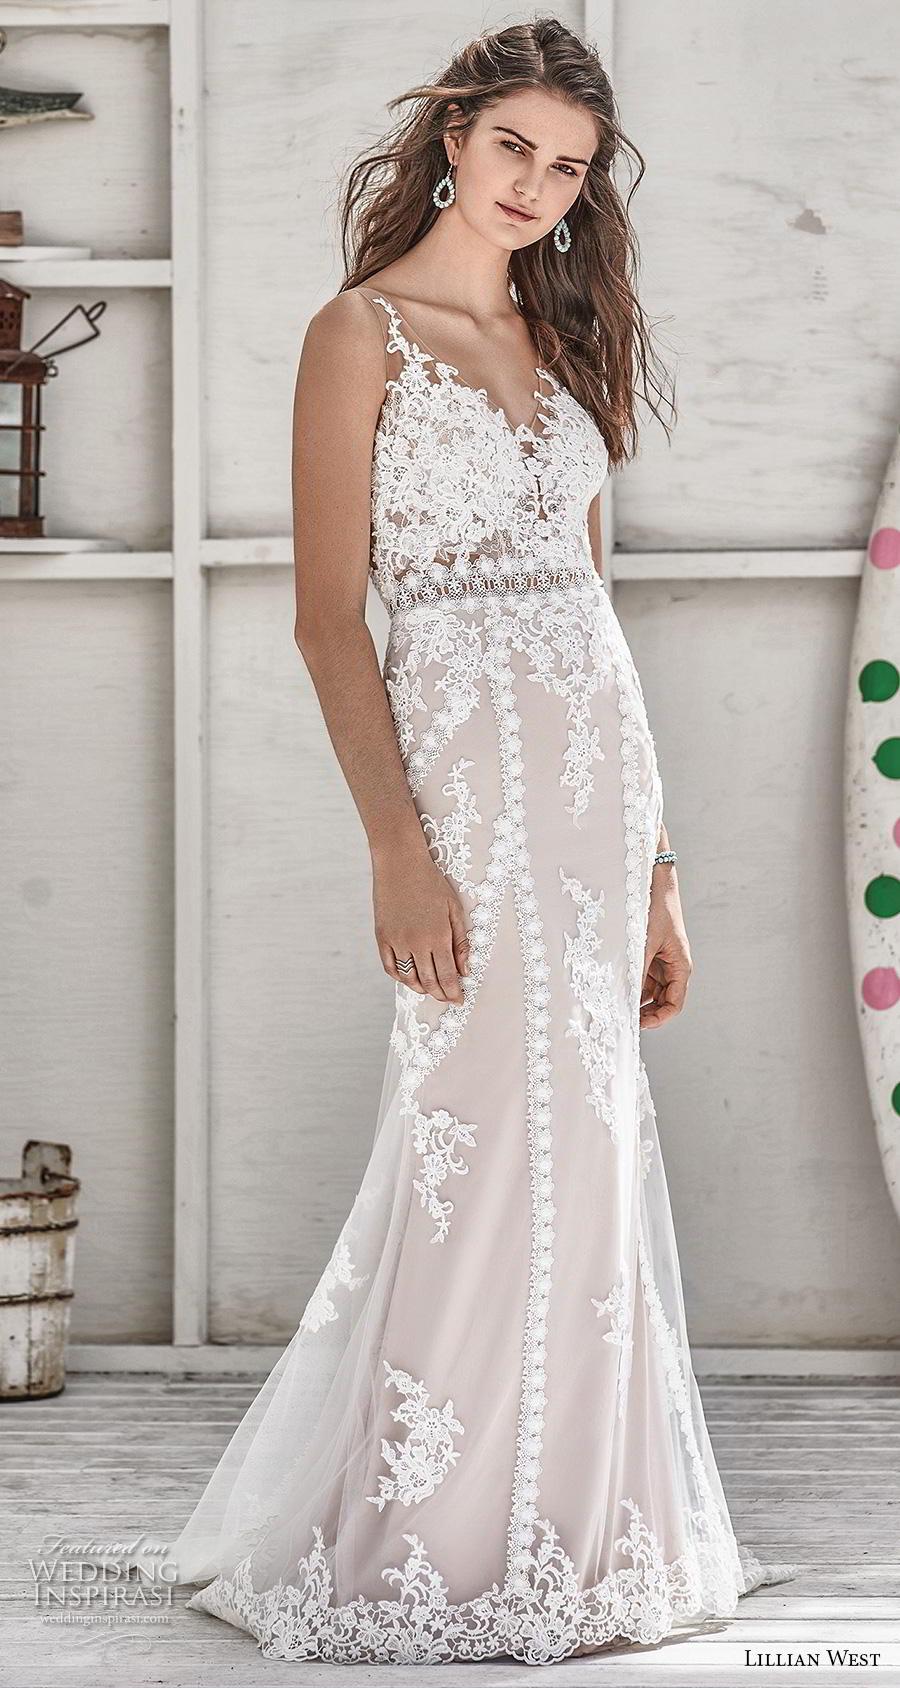 lillian west spring 2019 bridal sleeveless with strap v neck full embellishment elegant blush fit and flare sheath wedding dress sheer button back medium train (4) mv